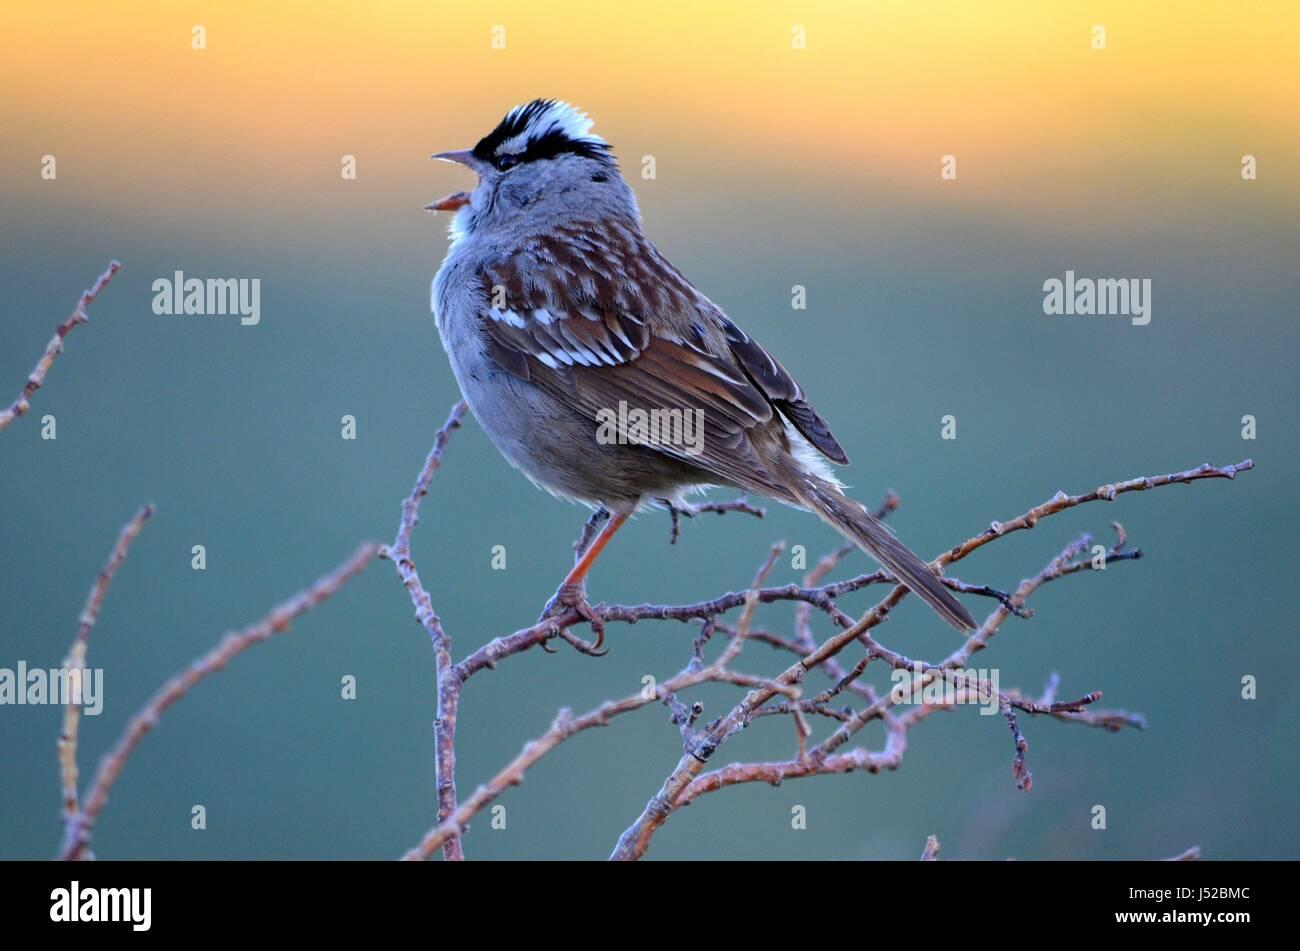 Sparrow Singing at Sunrise - Stock Image